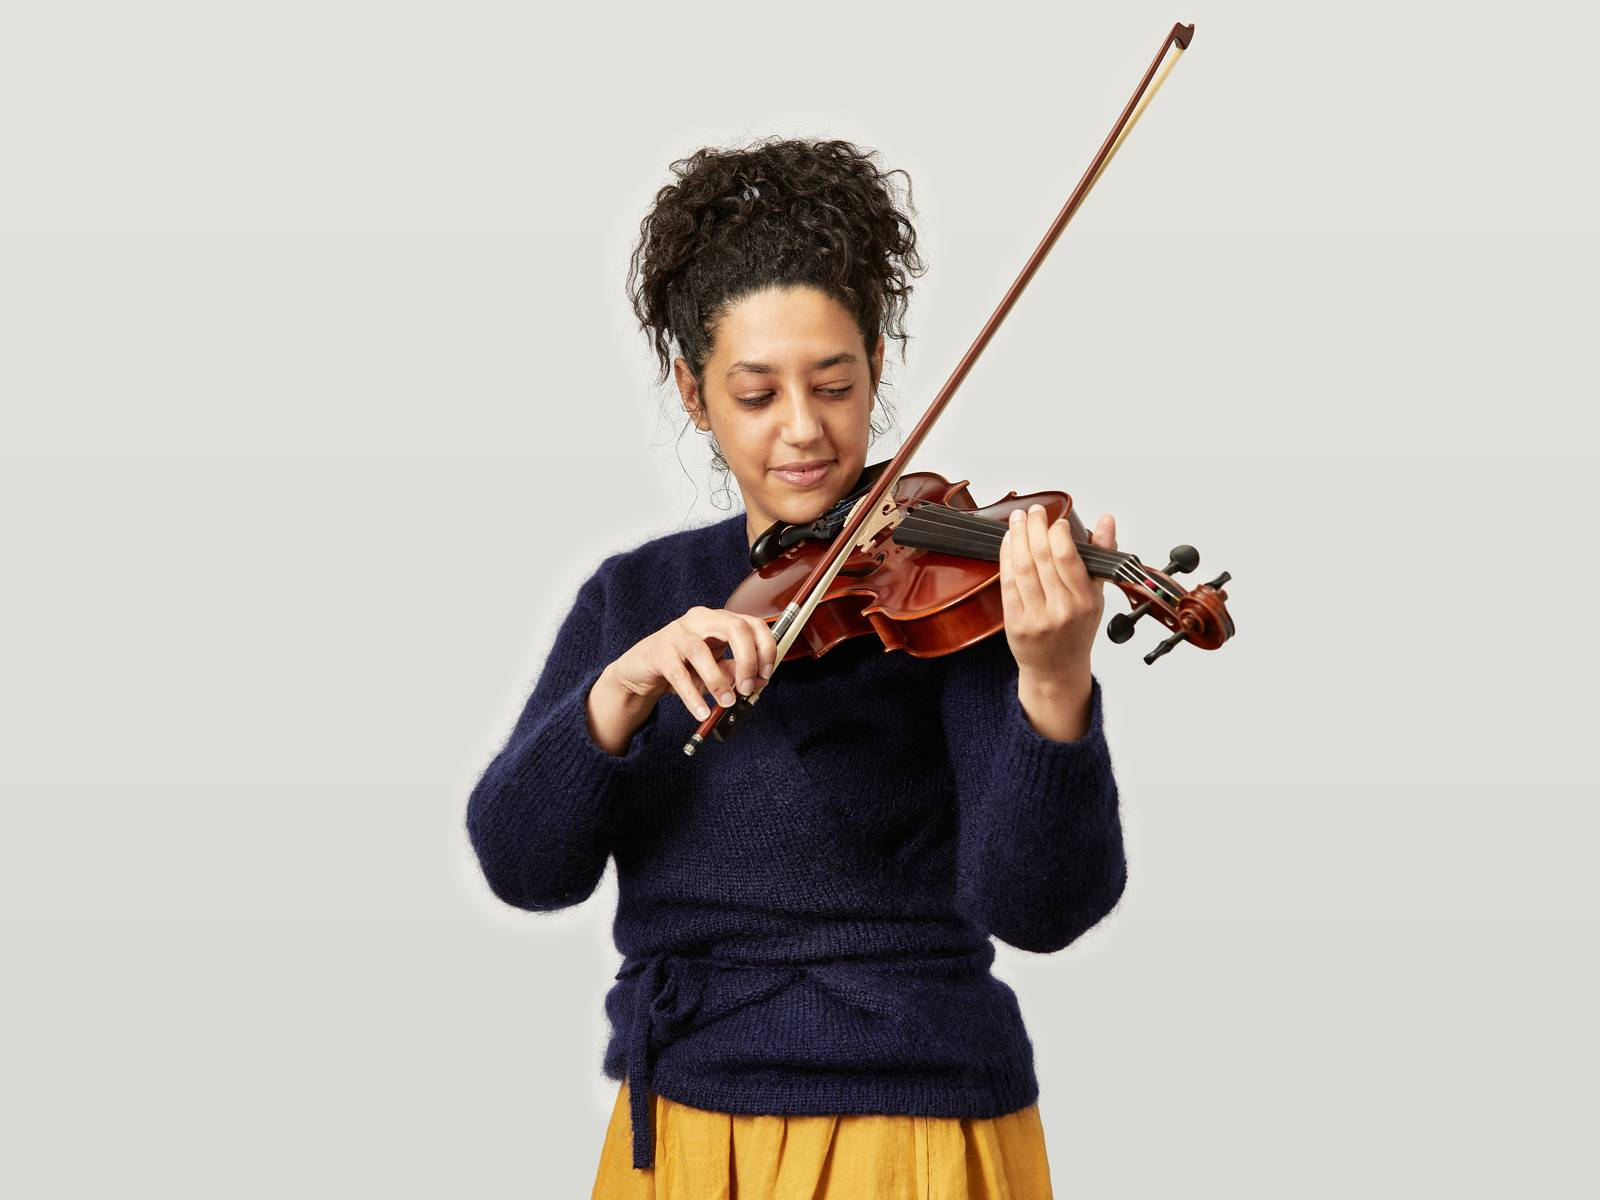 Melissa playing a violin.jpg